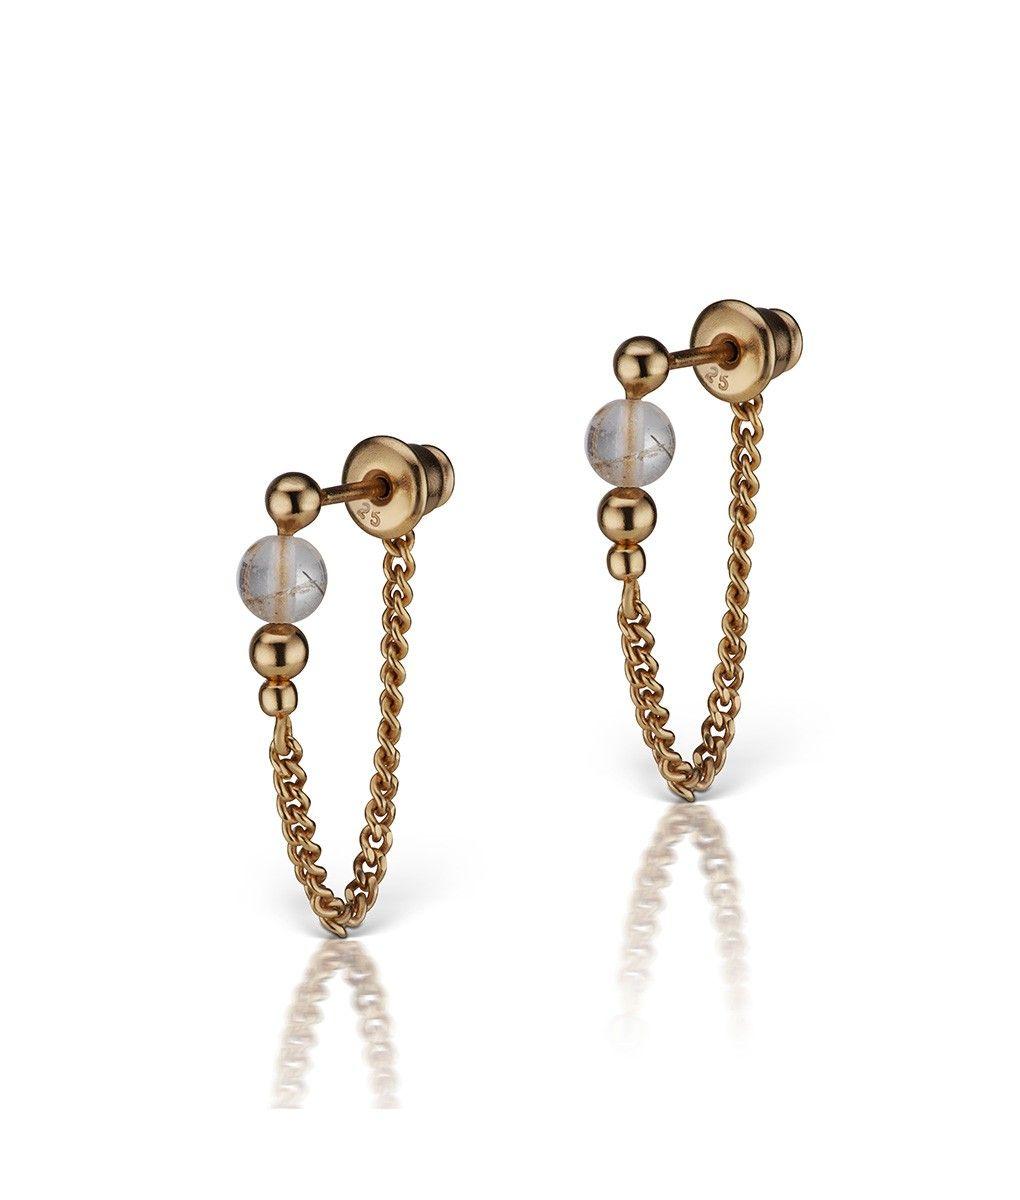 Mania Mania Chelsea Earrings - 18K Gold Vermeil and Phantom Quartz